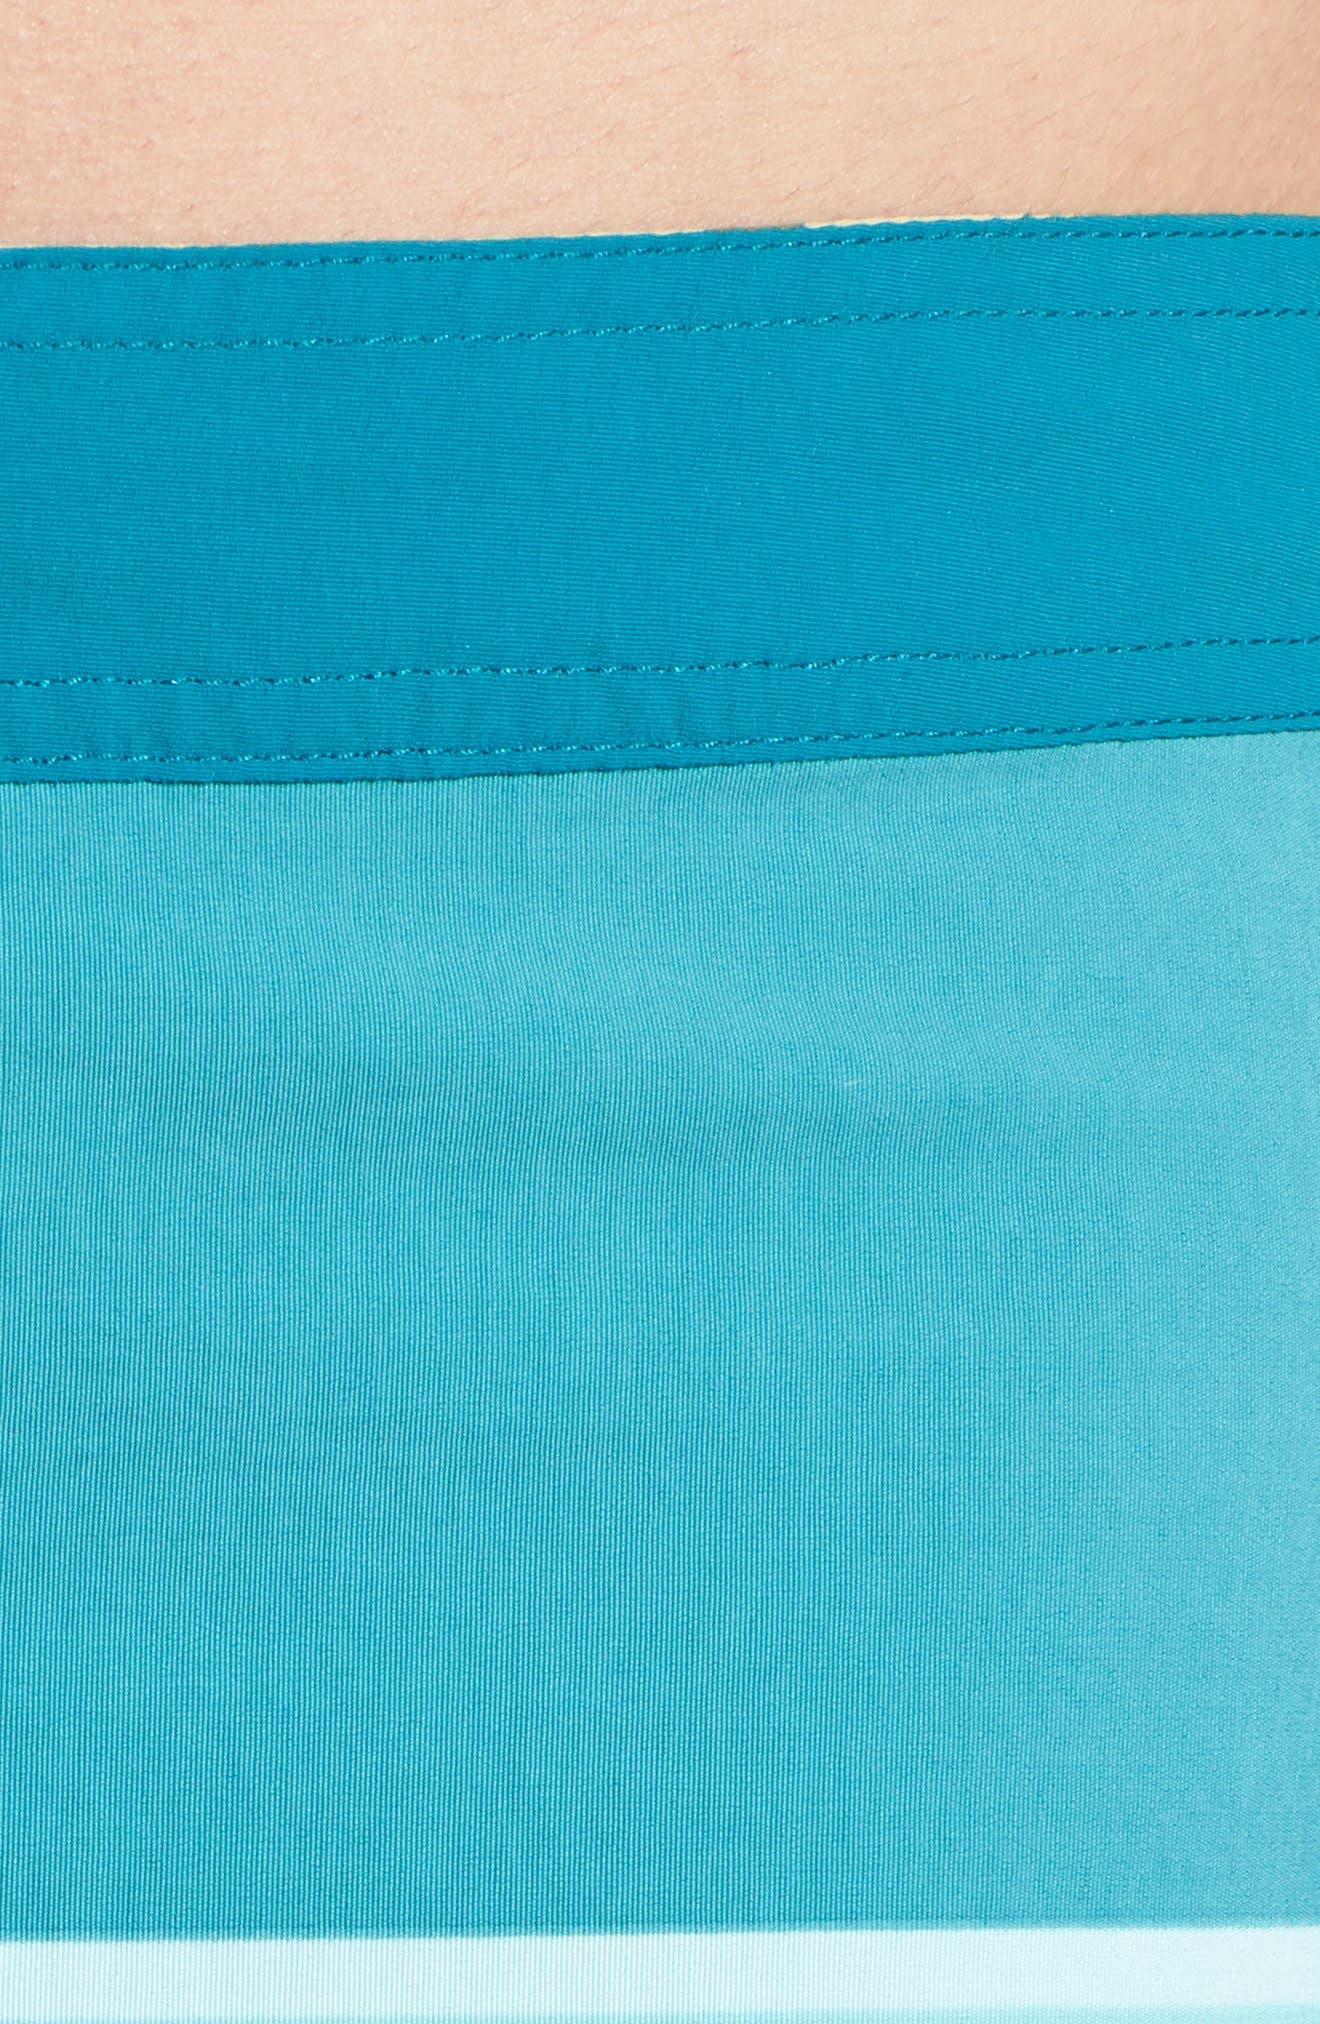 PATAGONIA,                             Wavefarer Board Shorts,                             Alternate thumbnail 4, color,                             404